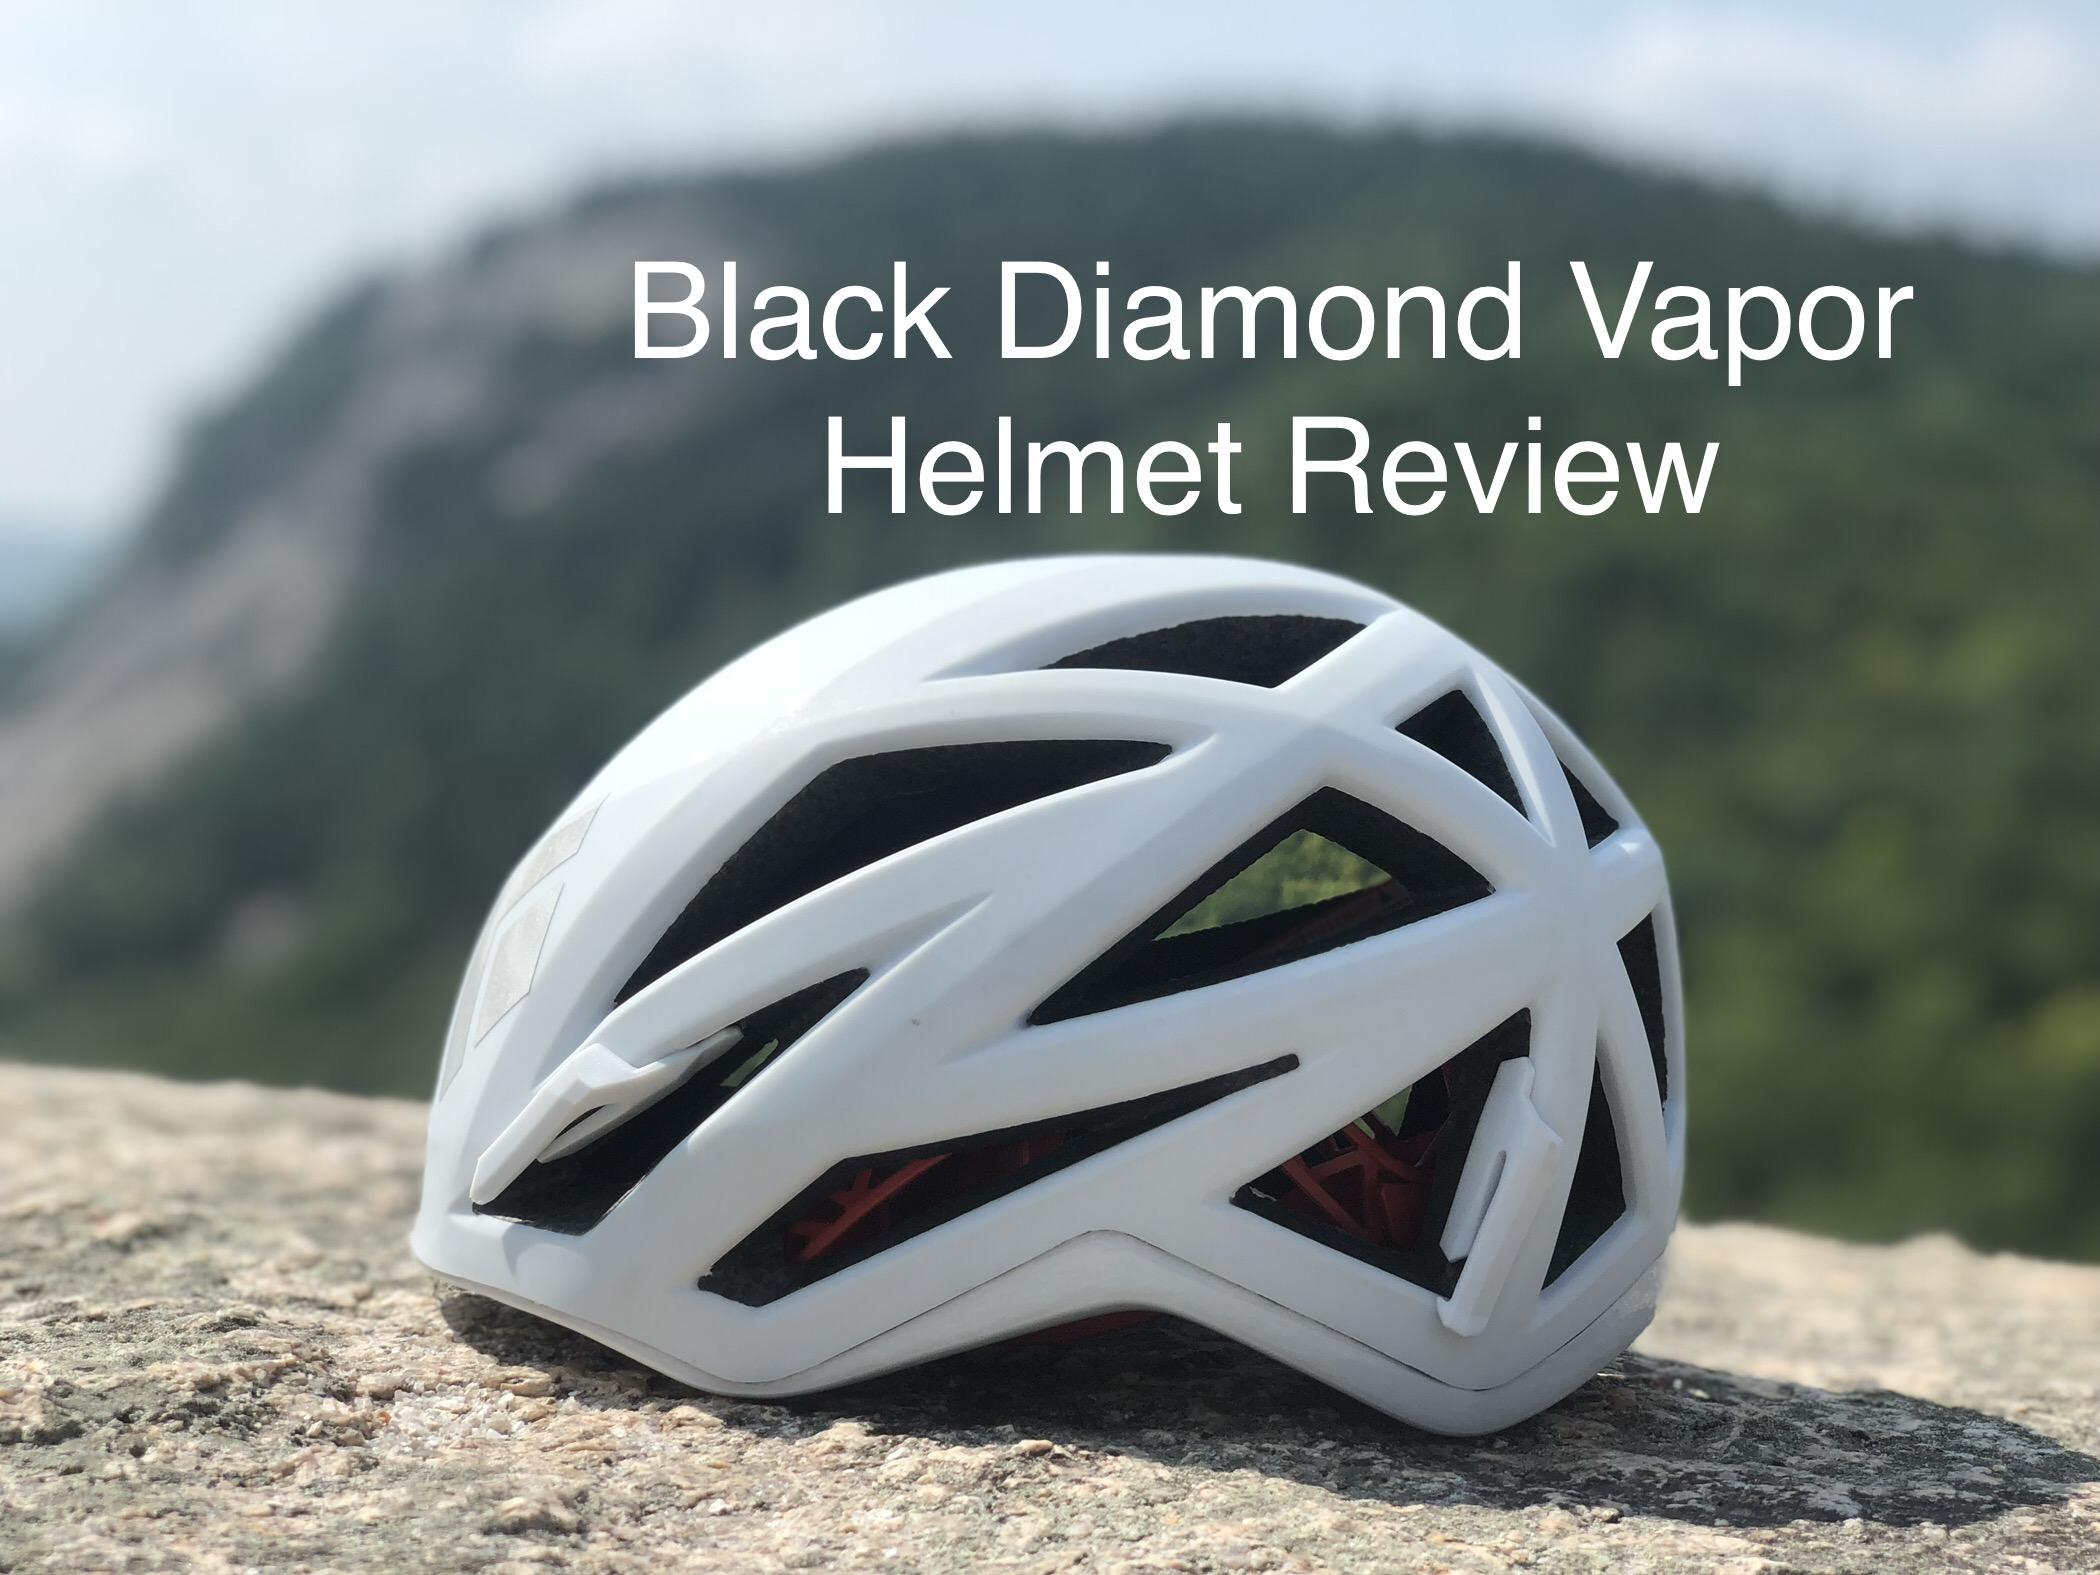 Black Diamond Vapor Helmet Review